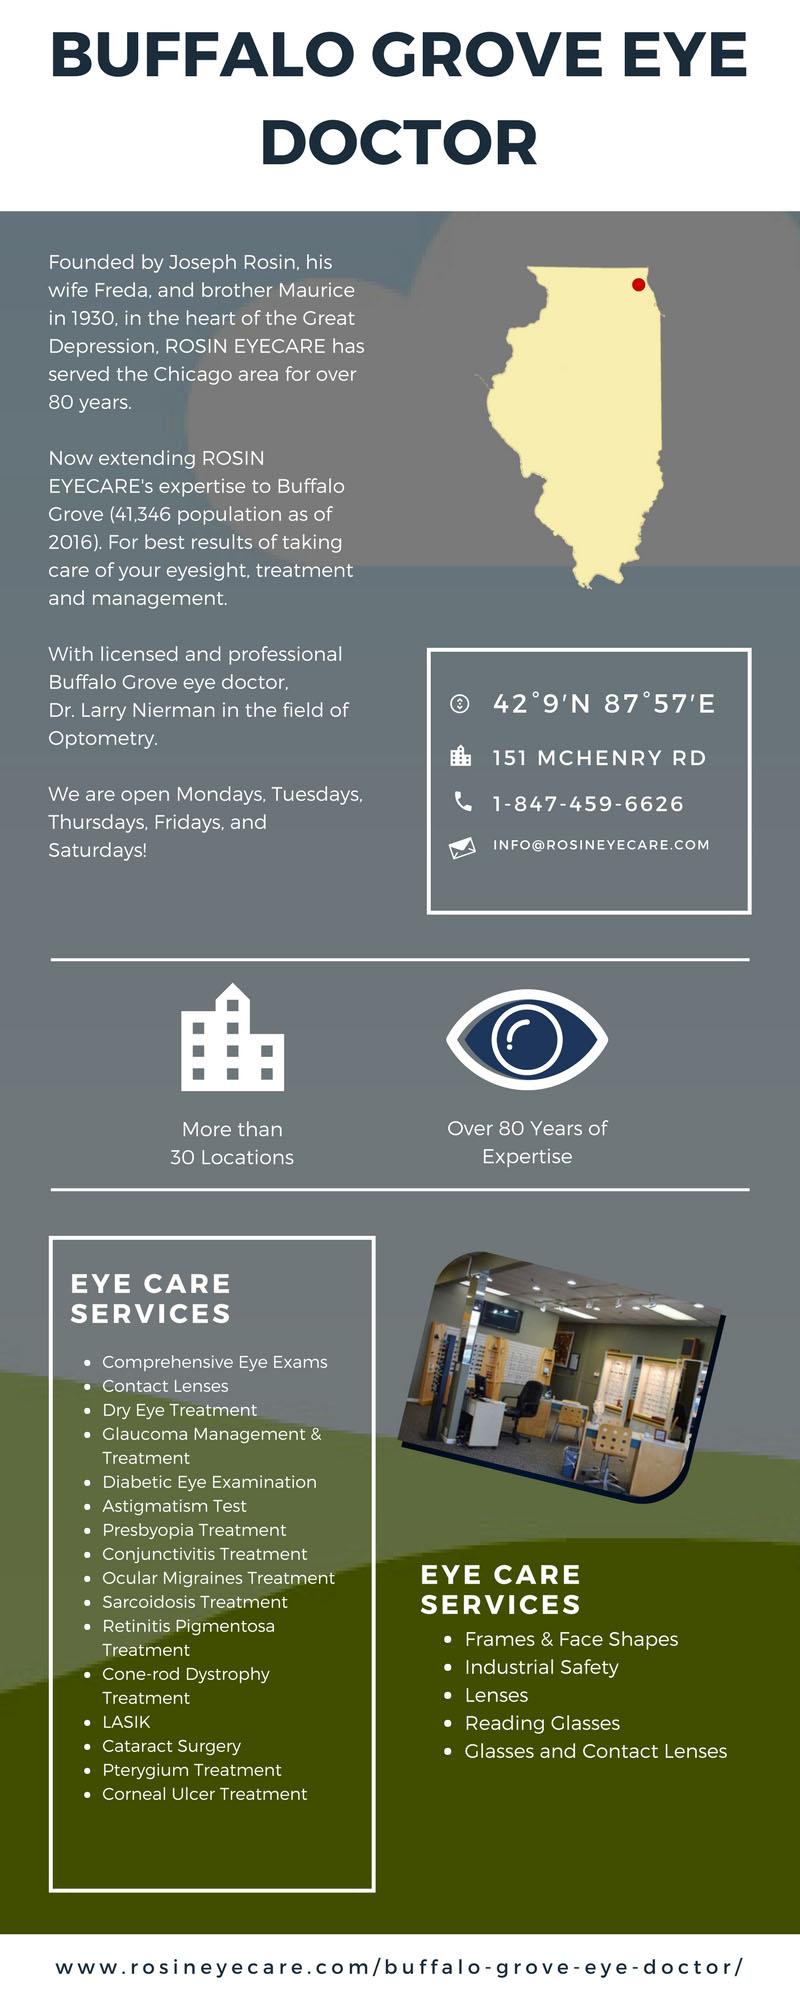 95aa530c1ed5 Image.ibb.co/iSjzv7/buffalo_grove_eye_doctor_infographic.jpg